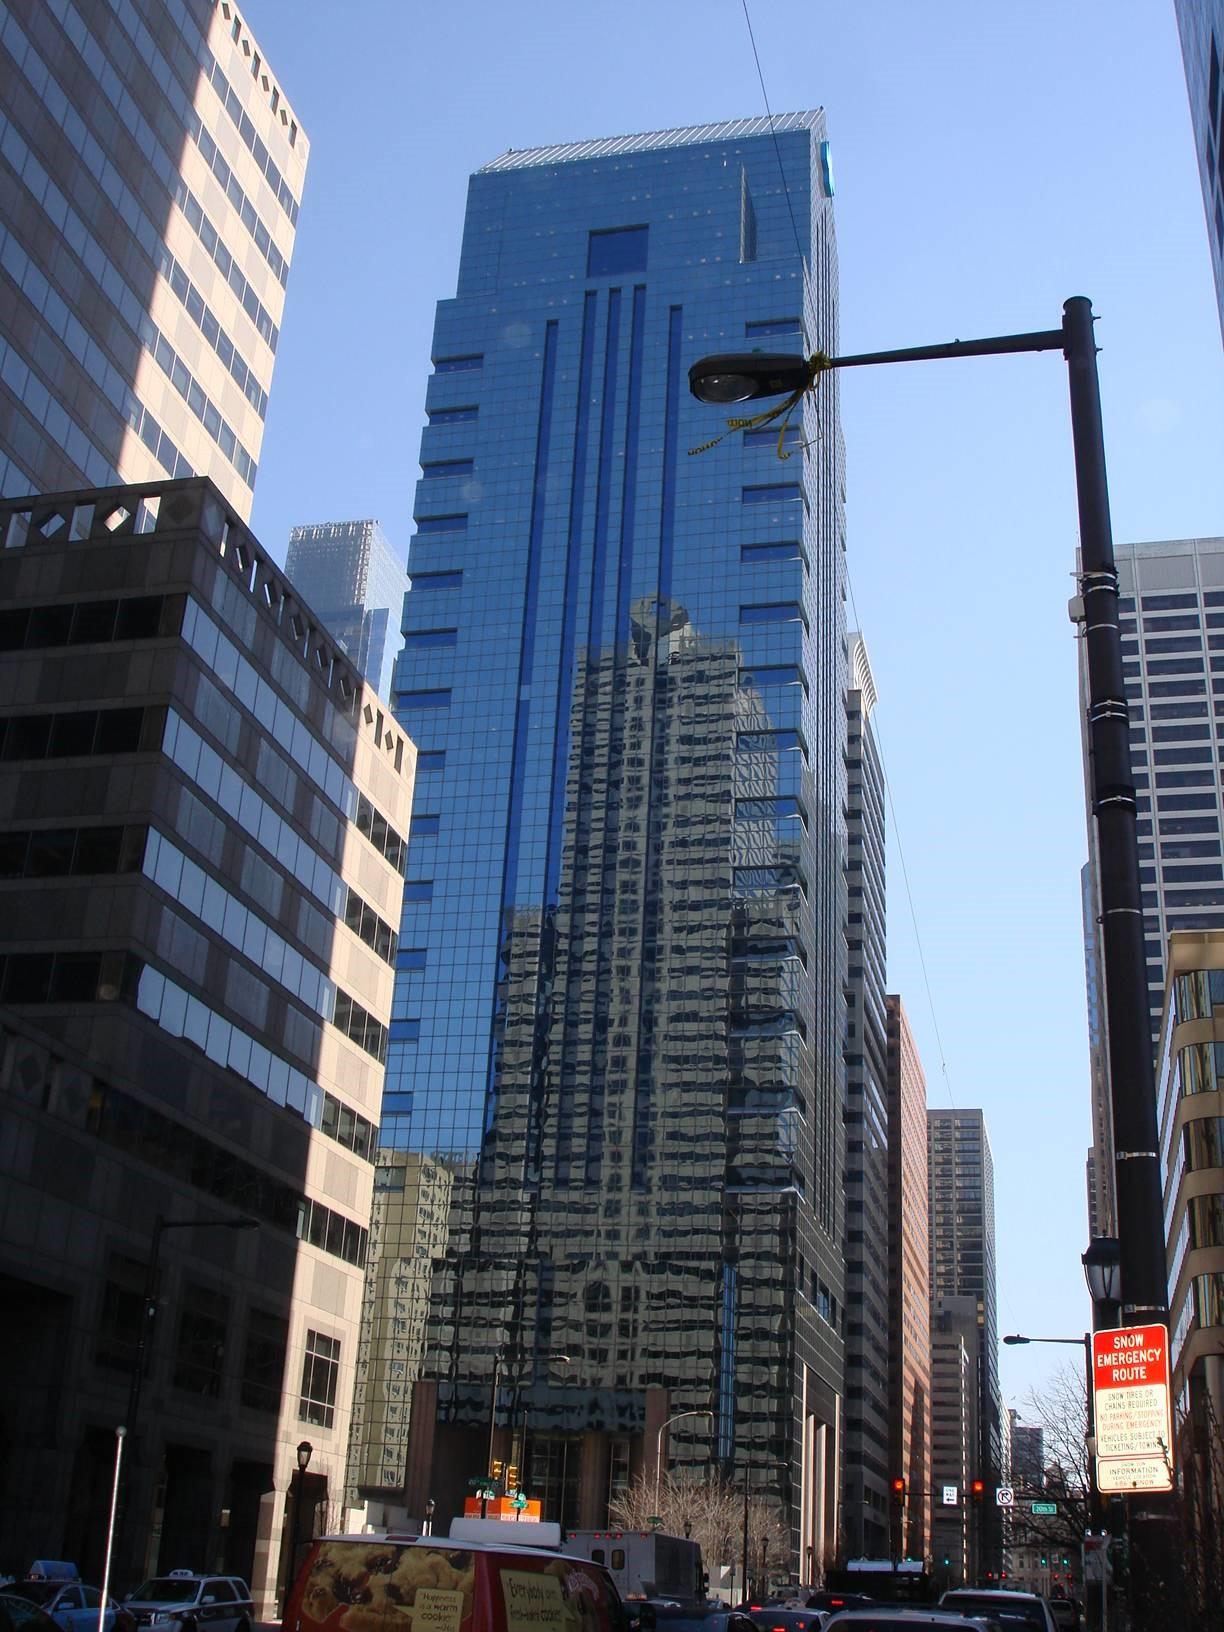 Independence Blue Cross - Parking Structures Restoration